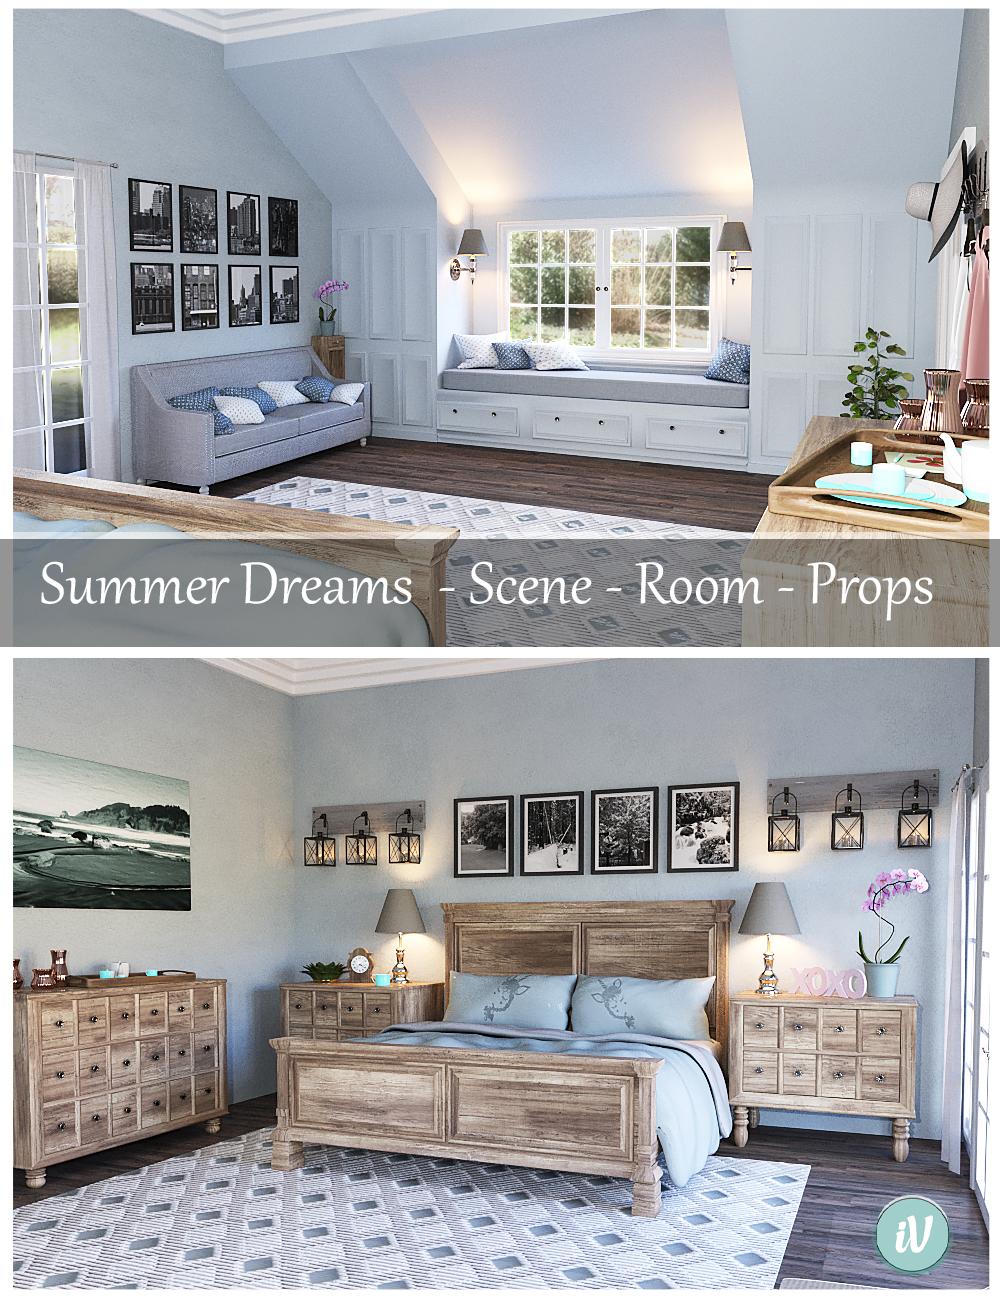 iV Summer Dreams Bedroom by: i3D_LotusValery3D, 3D Models by Daz 3D